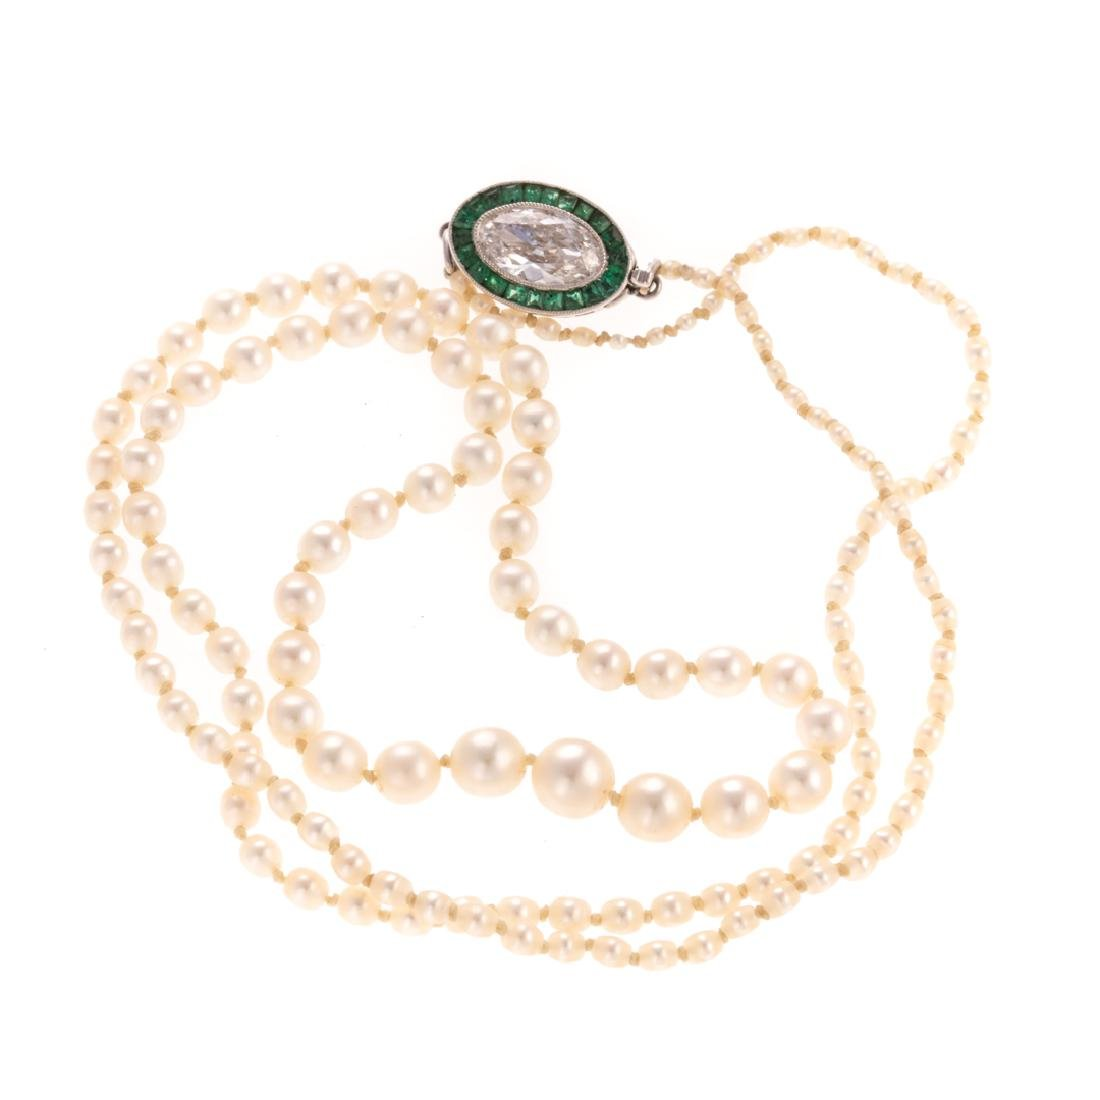 An Art Deco Diamond & Emerald Closure on Pearls